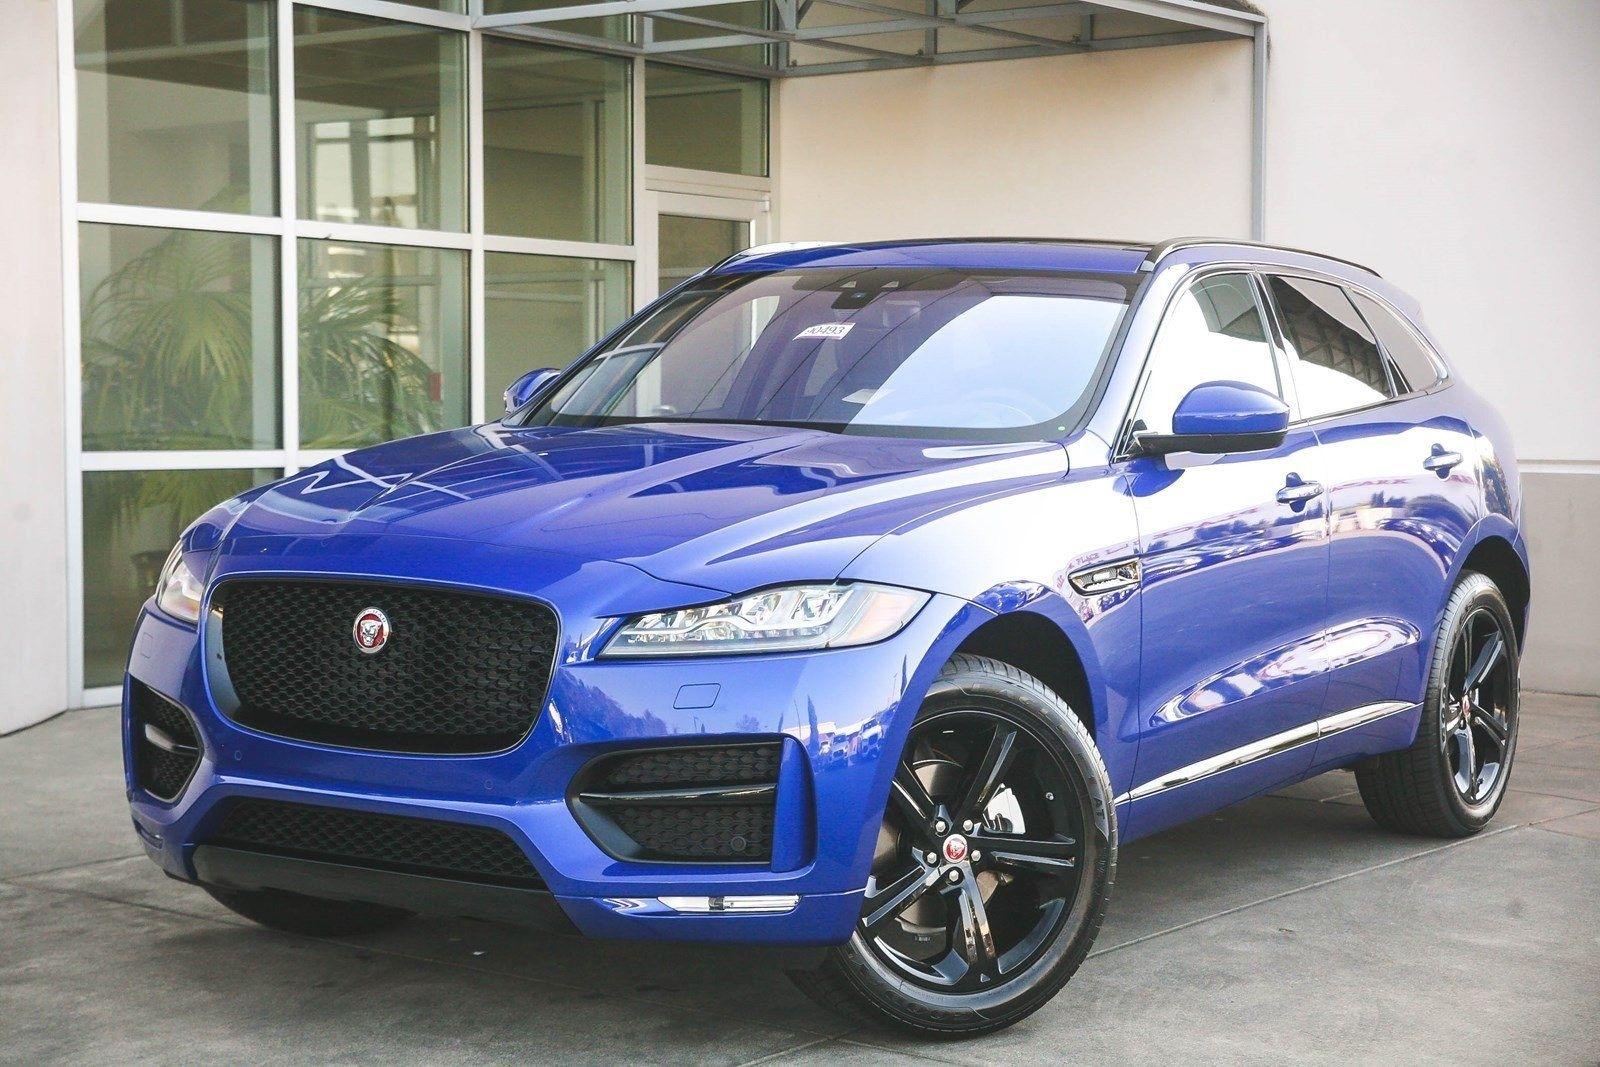 2020 F Pace Svr In 2020 Jaguar Suv Suv Models Suv Reviews